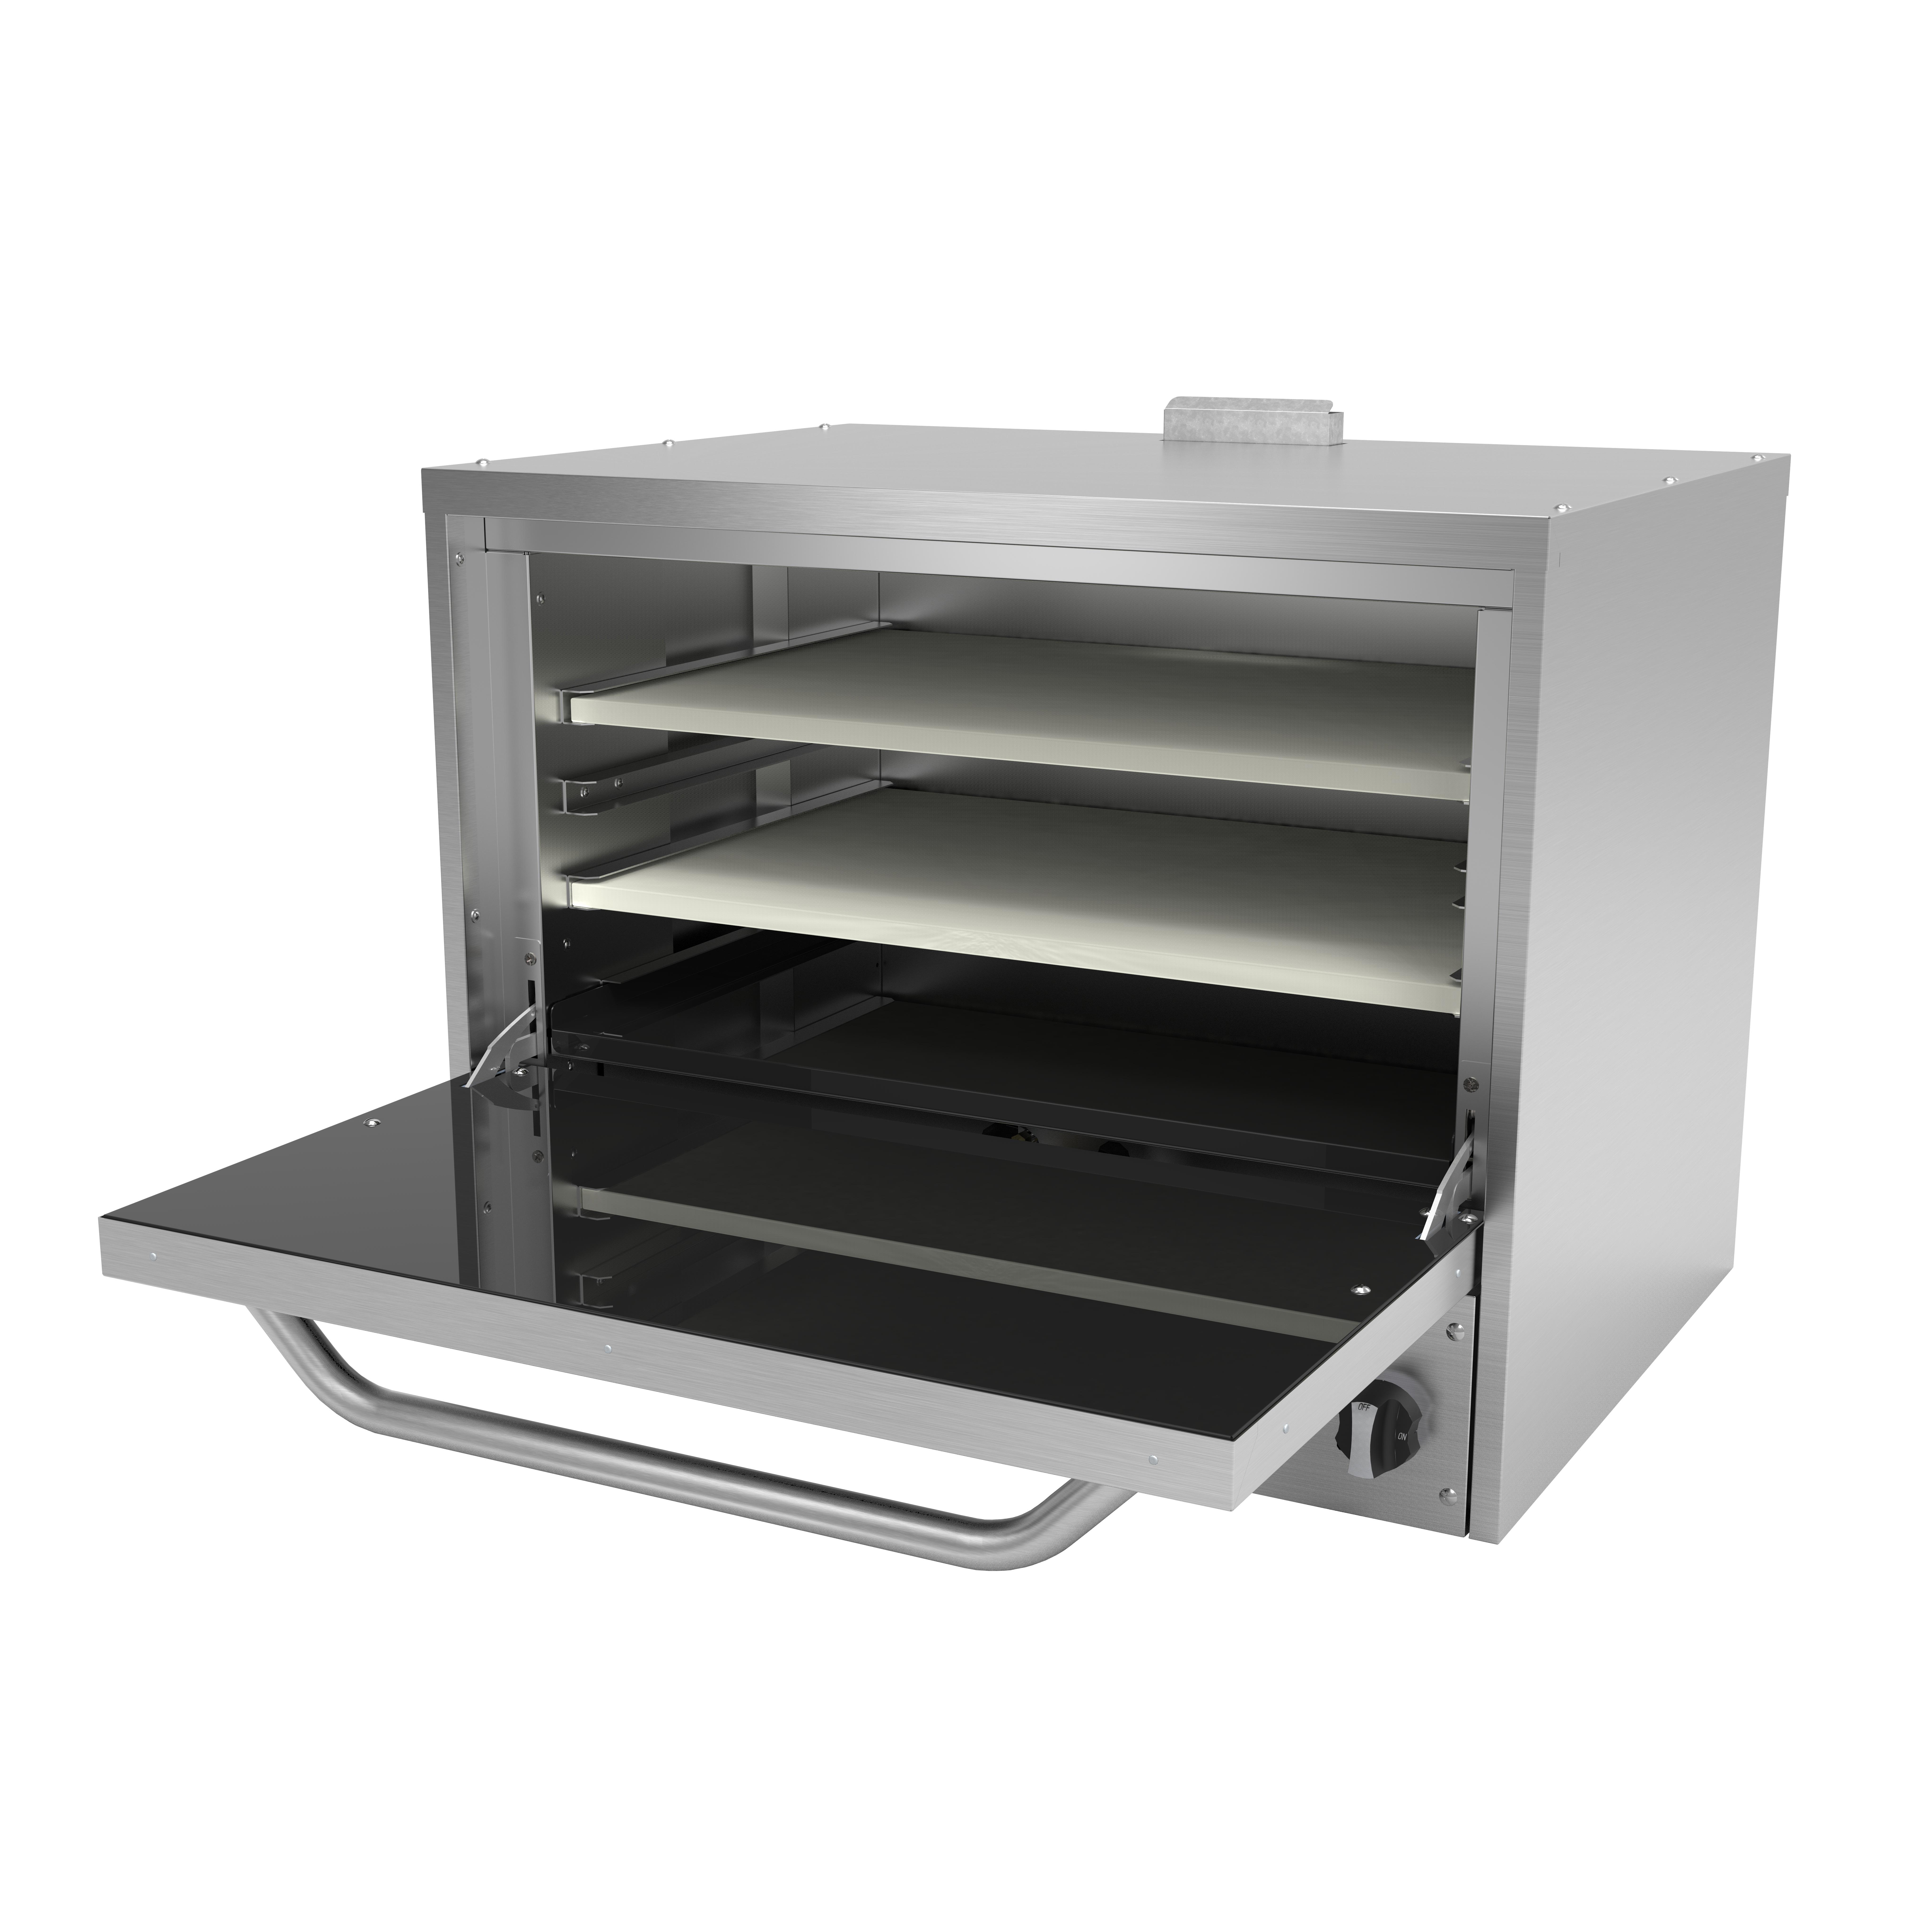 Asber AEPO-36 S pizza bake oven, countertop, gas